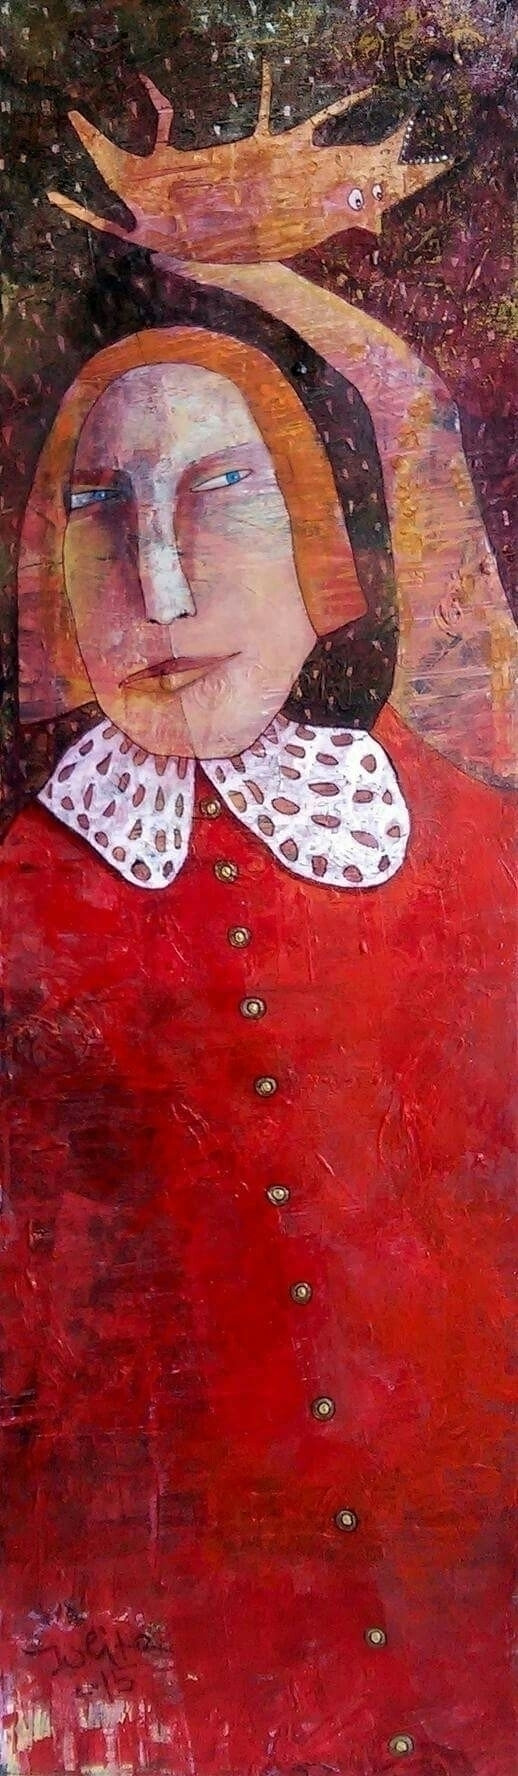 "red dress"" acrylic canvas 30X10 - jolitacc | ello"